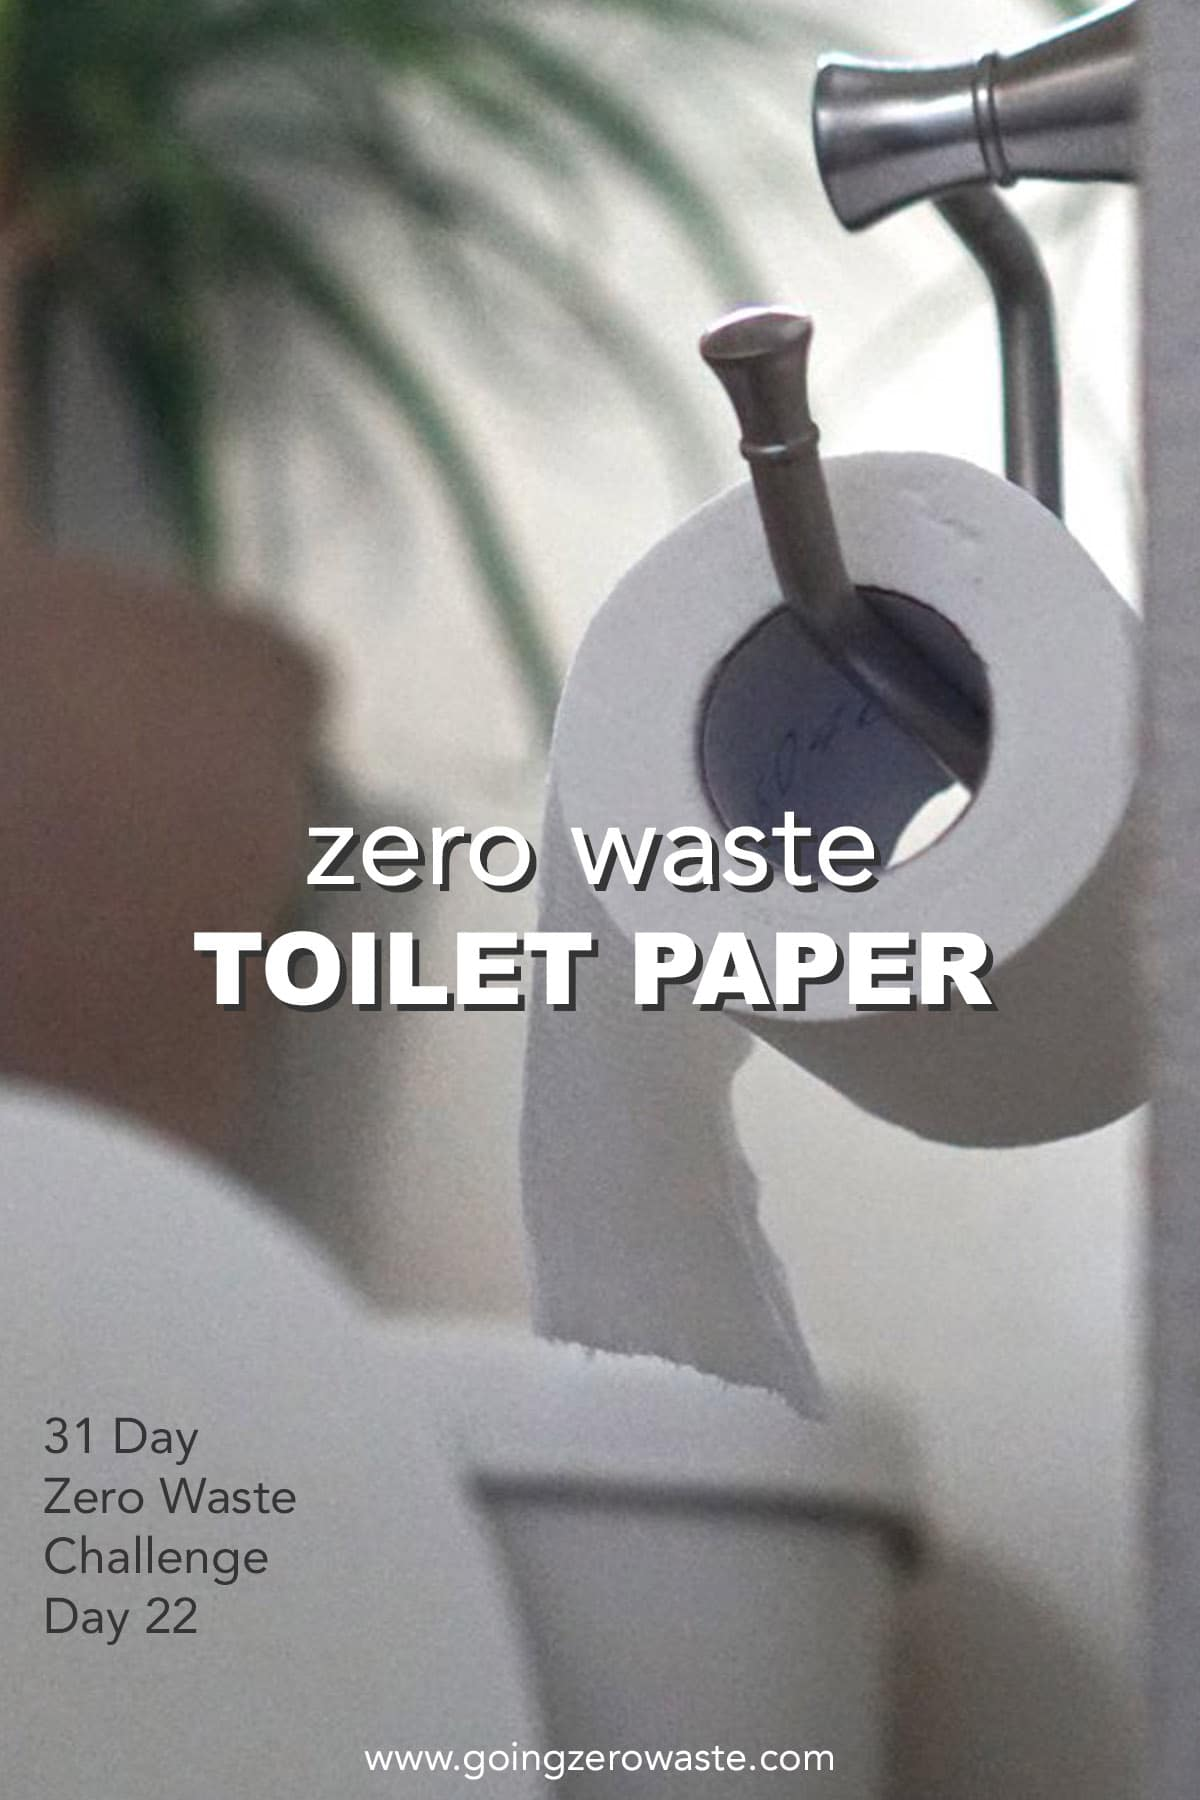 Zero Waste Toilet Paper - Day 22 of the Zero Waste Challenge from www.goingzerowaste.com #zerowaste #ecofriendly #gogreen #sustainable #zerowastechallenge #challenge #sustainablelivingchallenge #toiletpaper